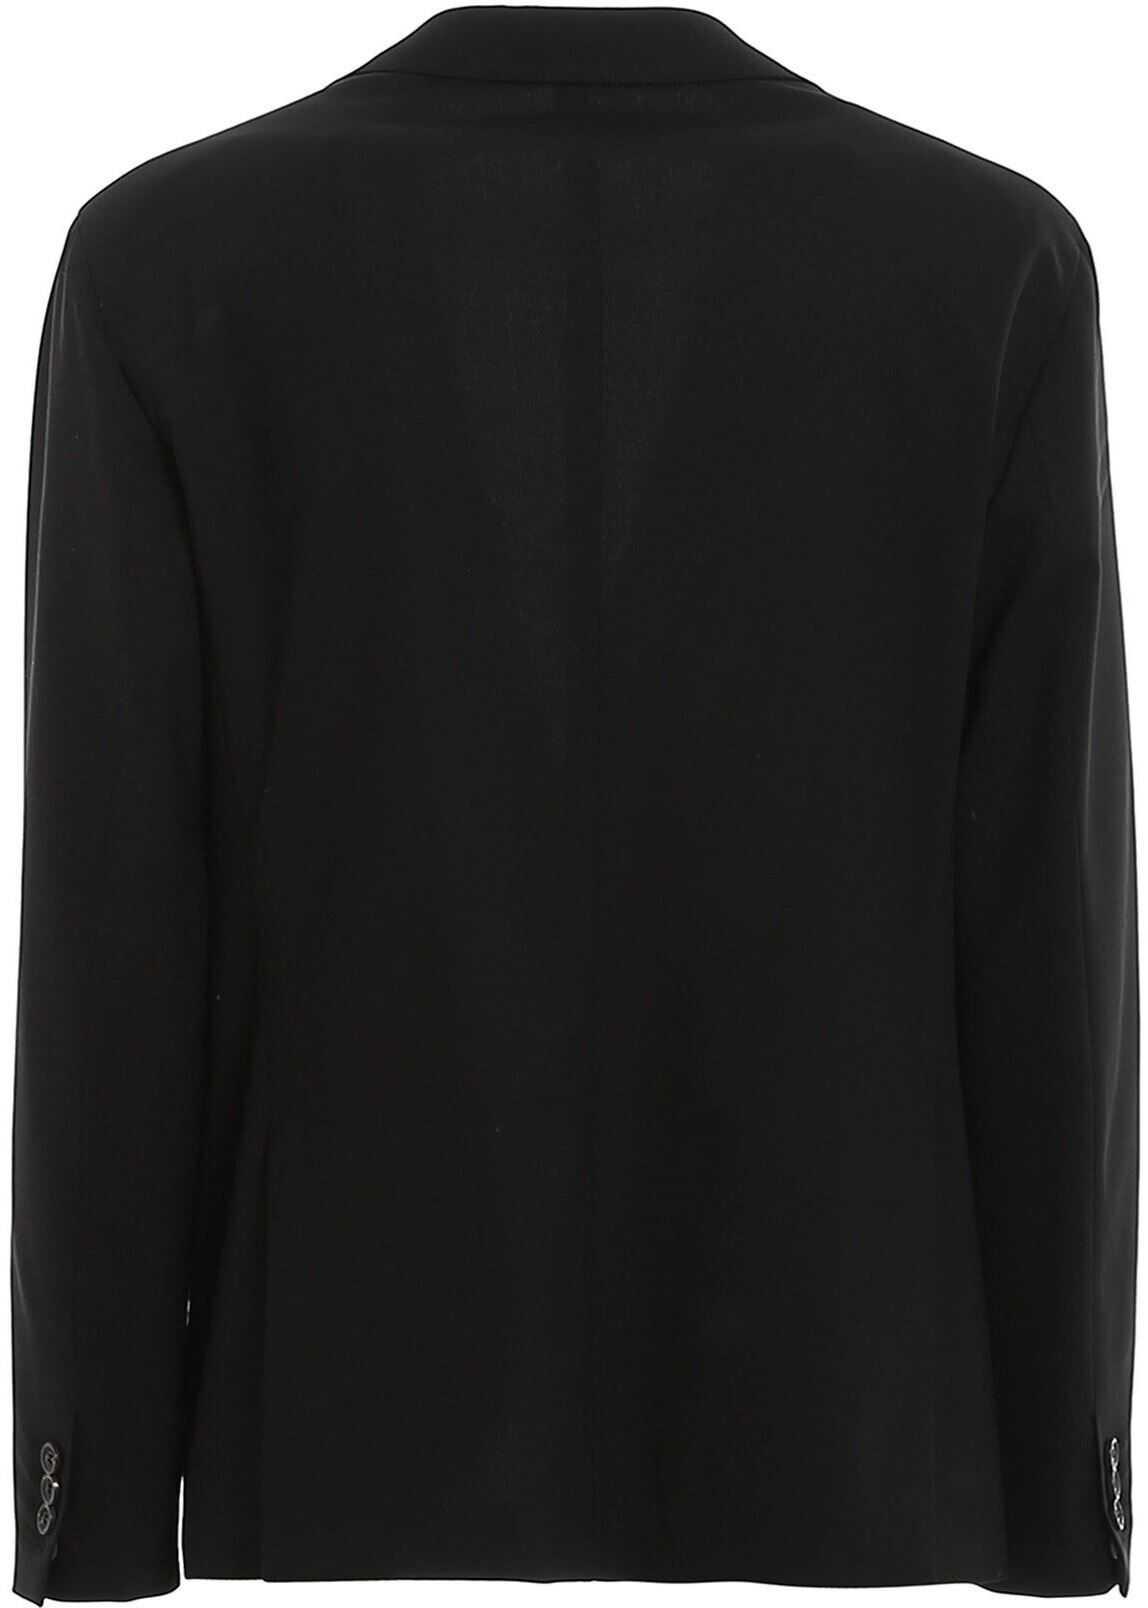 DSQUARED2 Manchester Suit Black imagine